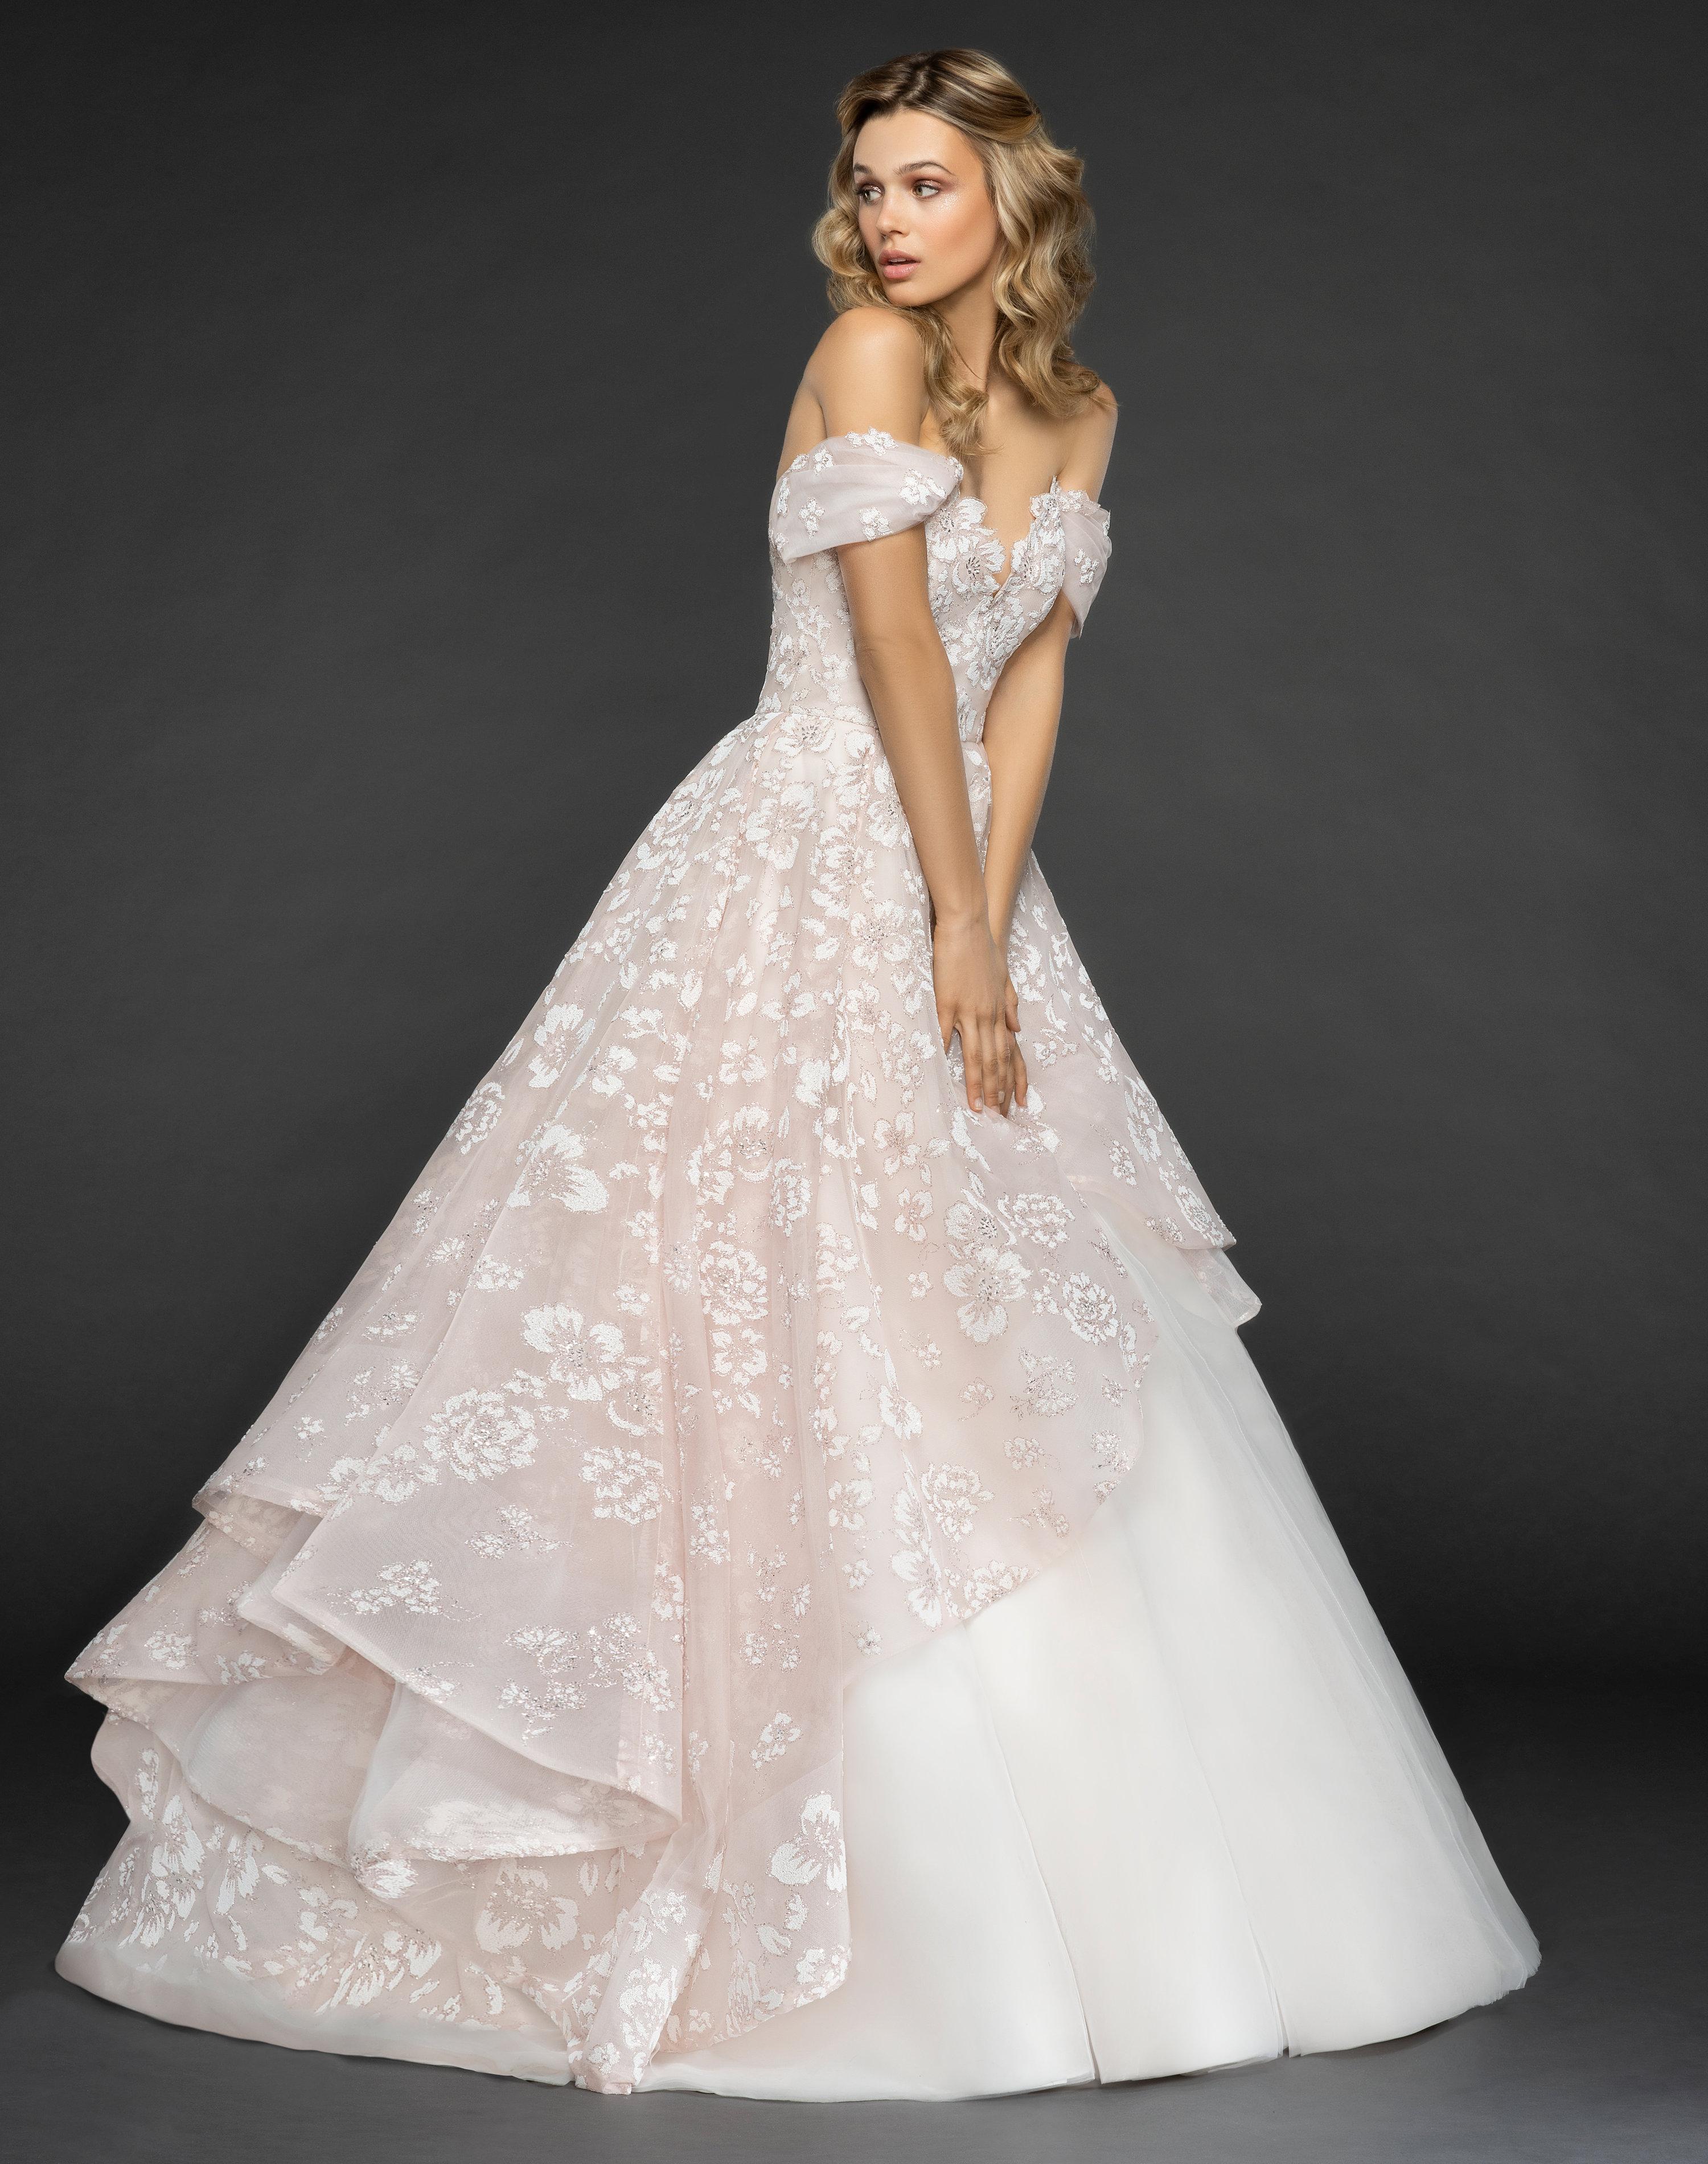 Off The Shoulder Floral Embroidered Ball Gown Wedding Dress Kleinfeld Bridal: Fancy Ball Dresses Wedding At Reisefeber.org